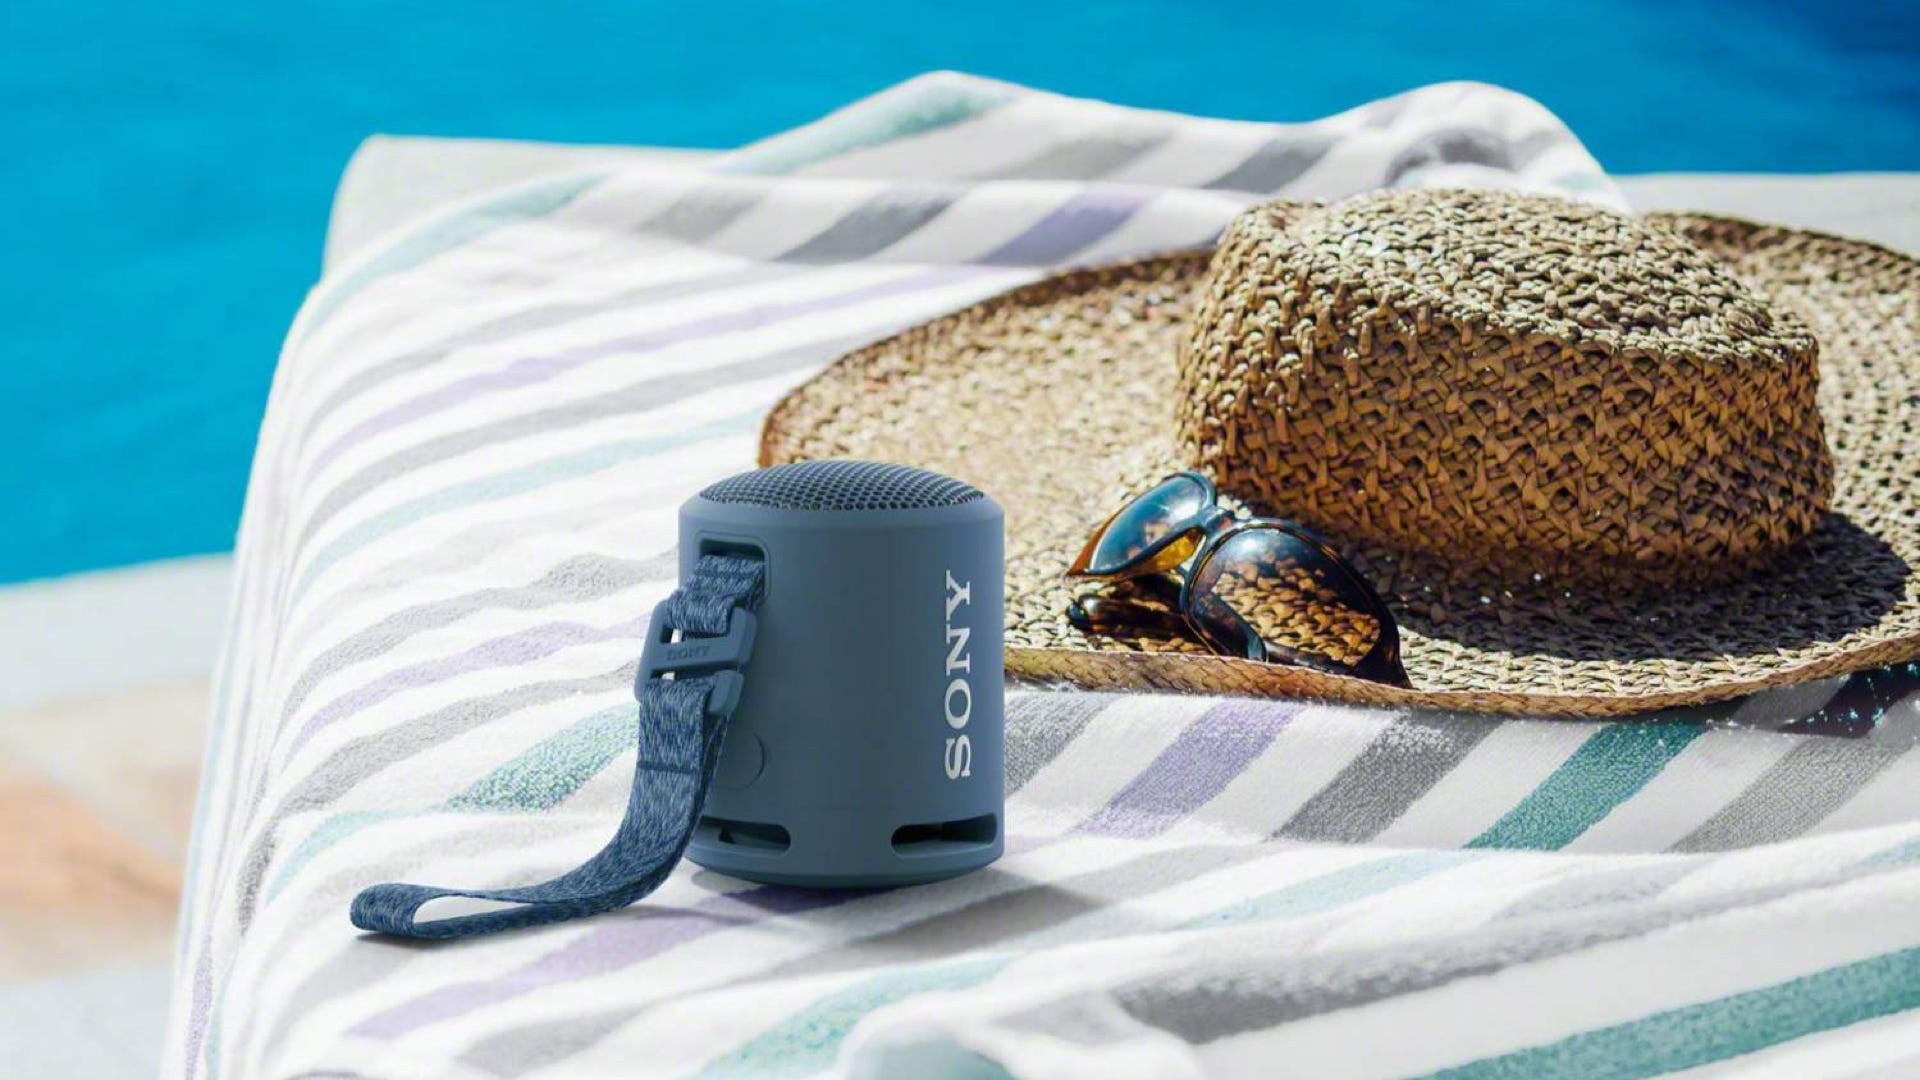 Sony's small XB13 speaker oudoors